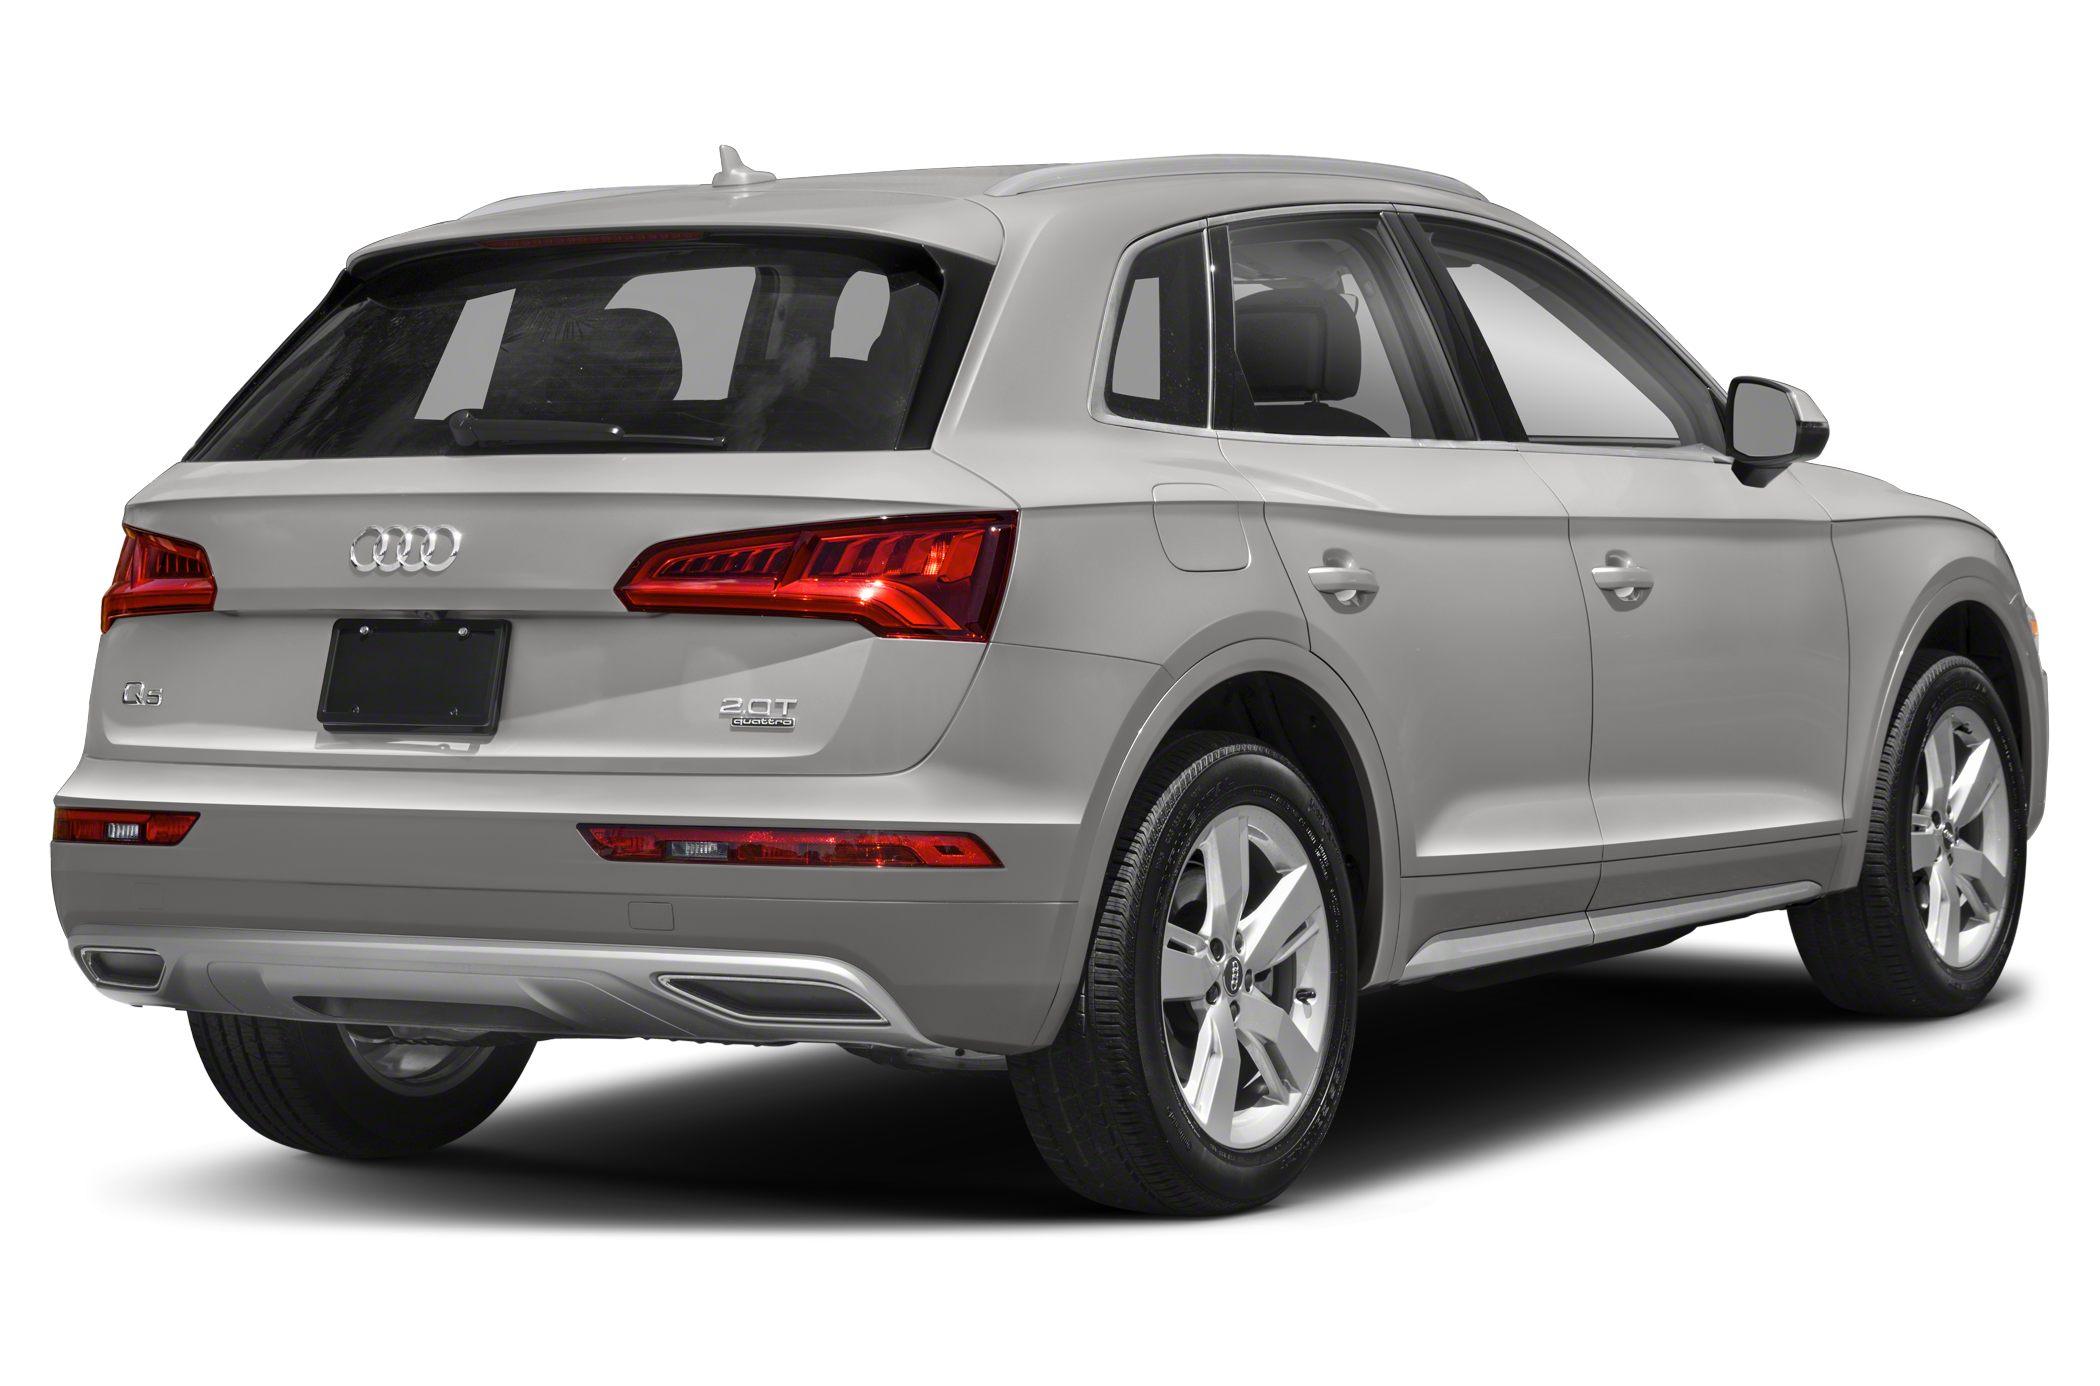 2018 Audi Q5 Money Factor >> See 2018 Audi Q5 Color Options - CarsDirect